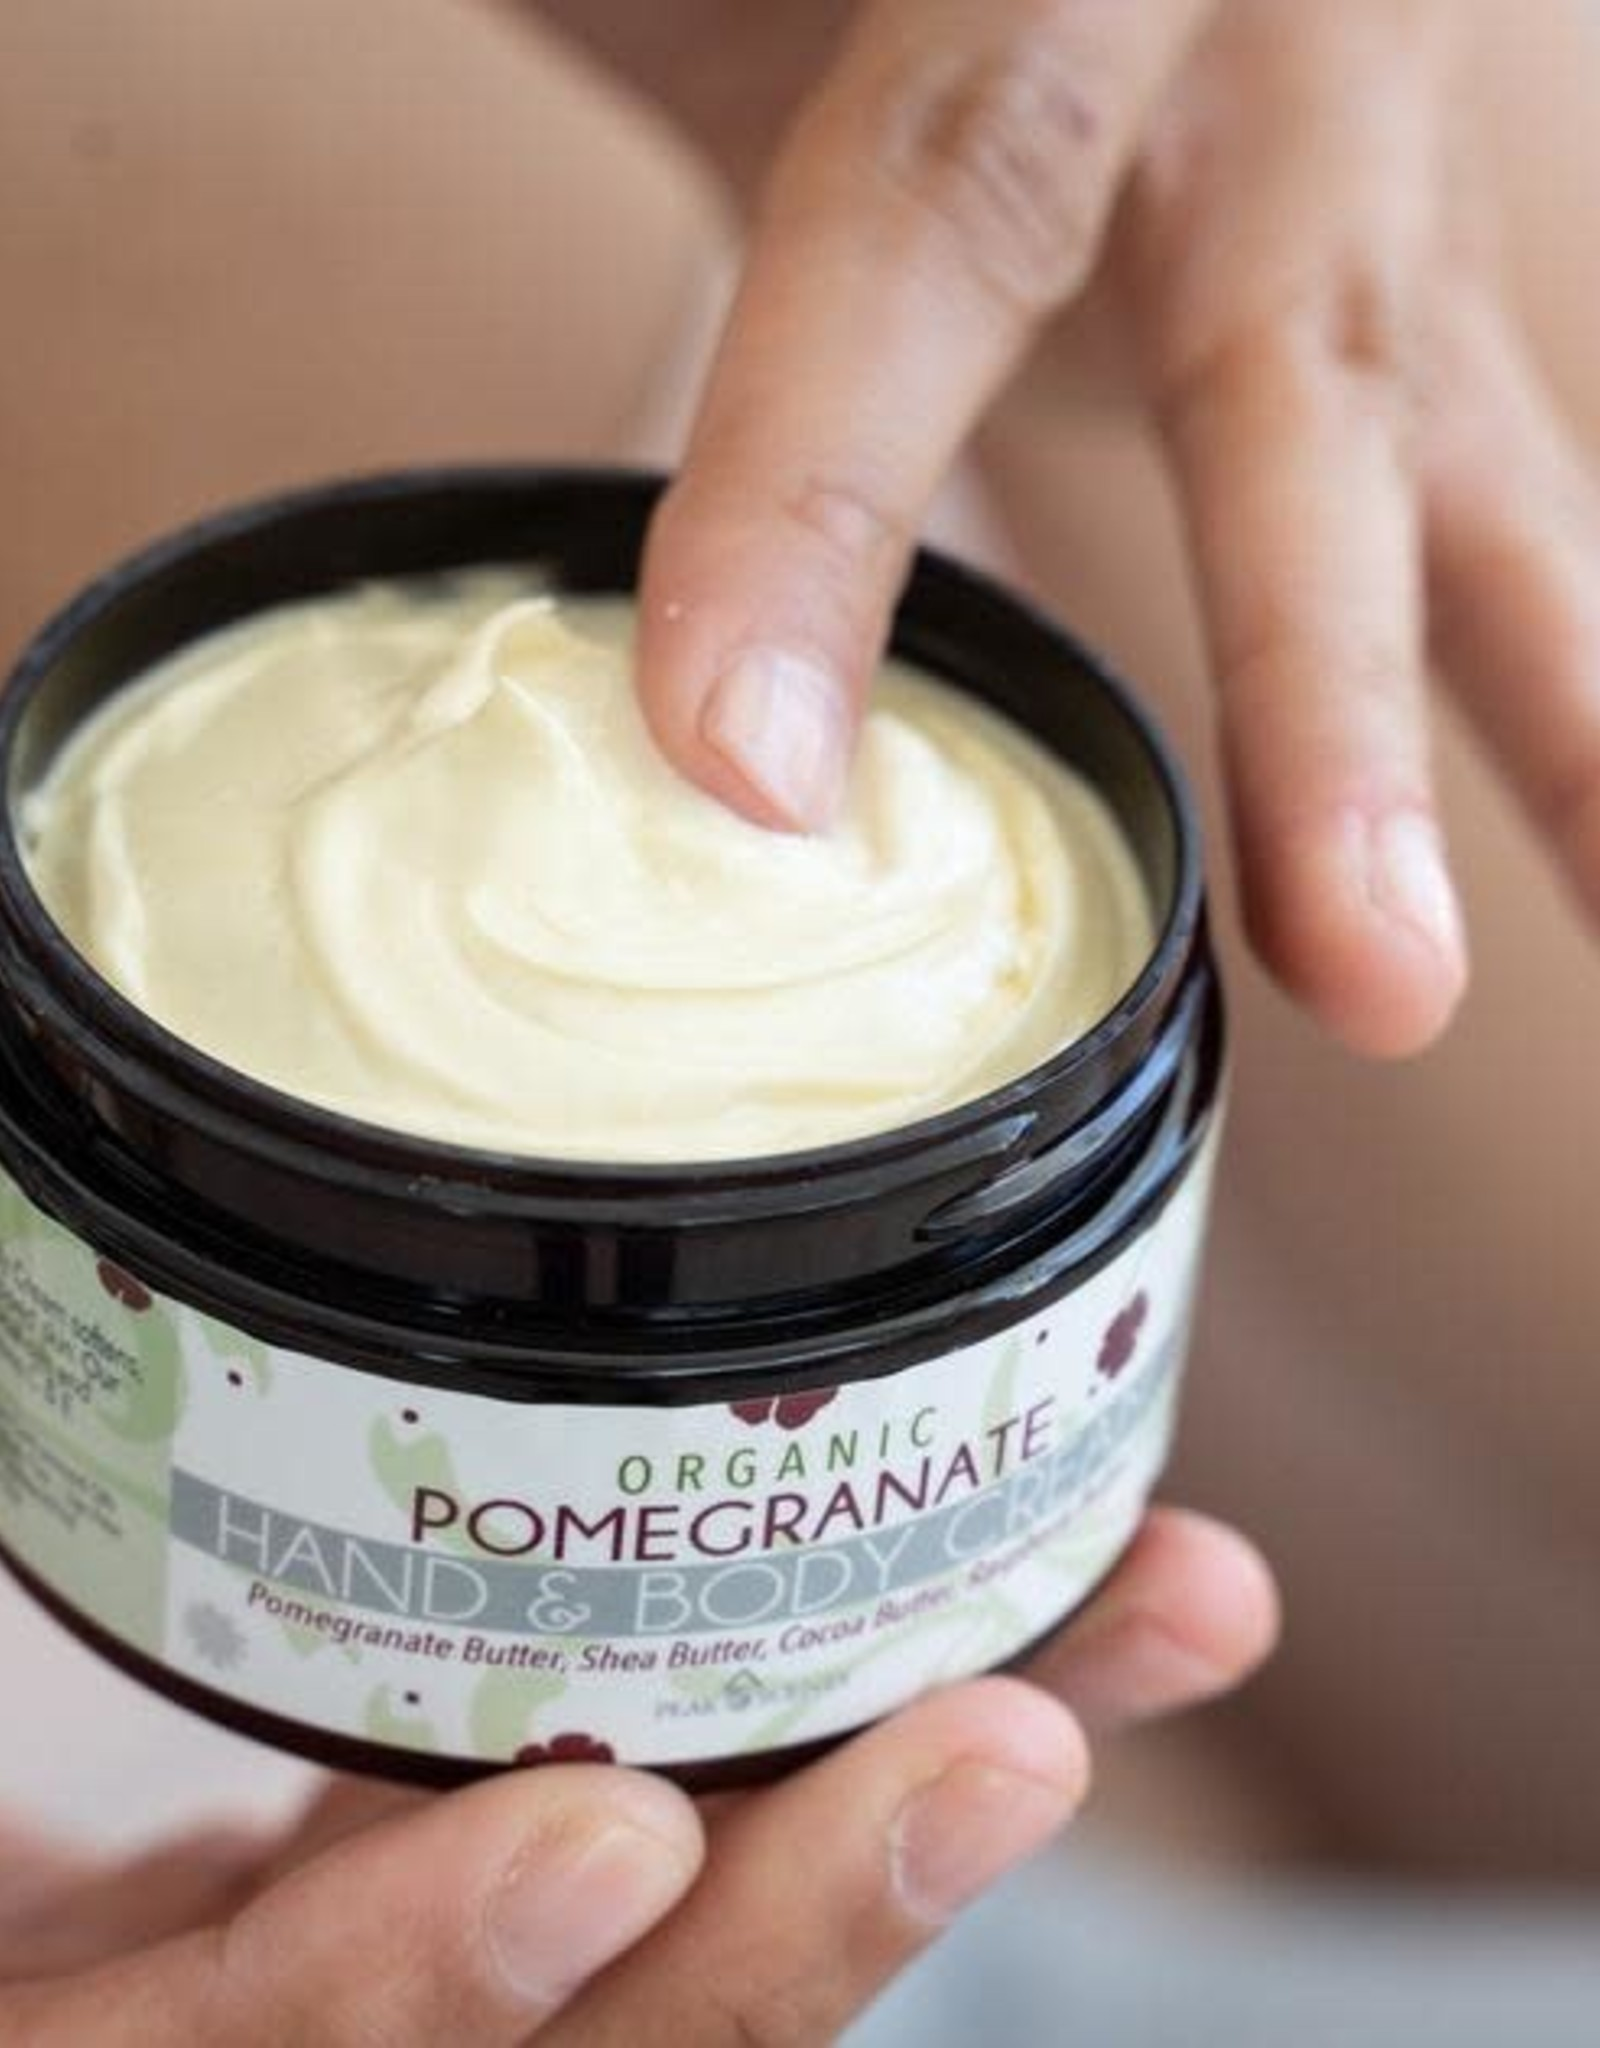 Rose Phyto3 Rose Phyto3 Pomegranate Hand & Body Cream, 4 oz